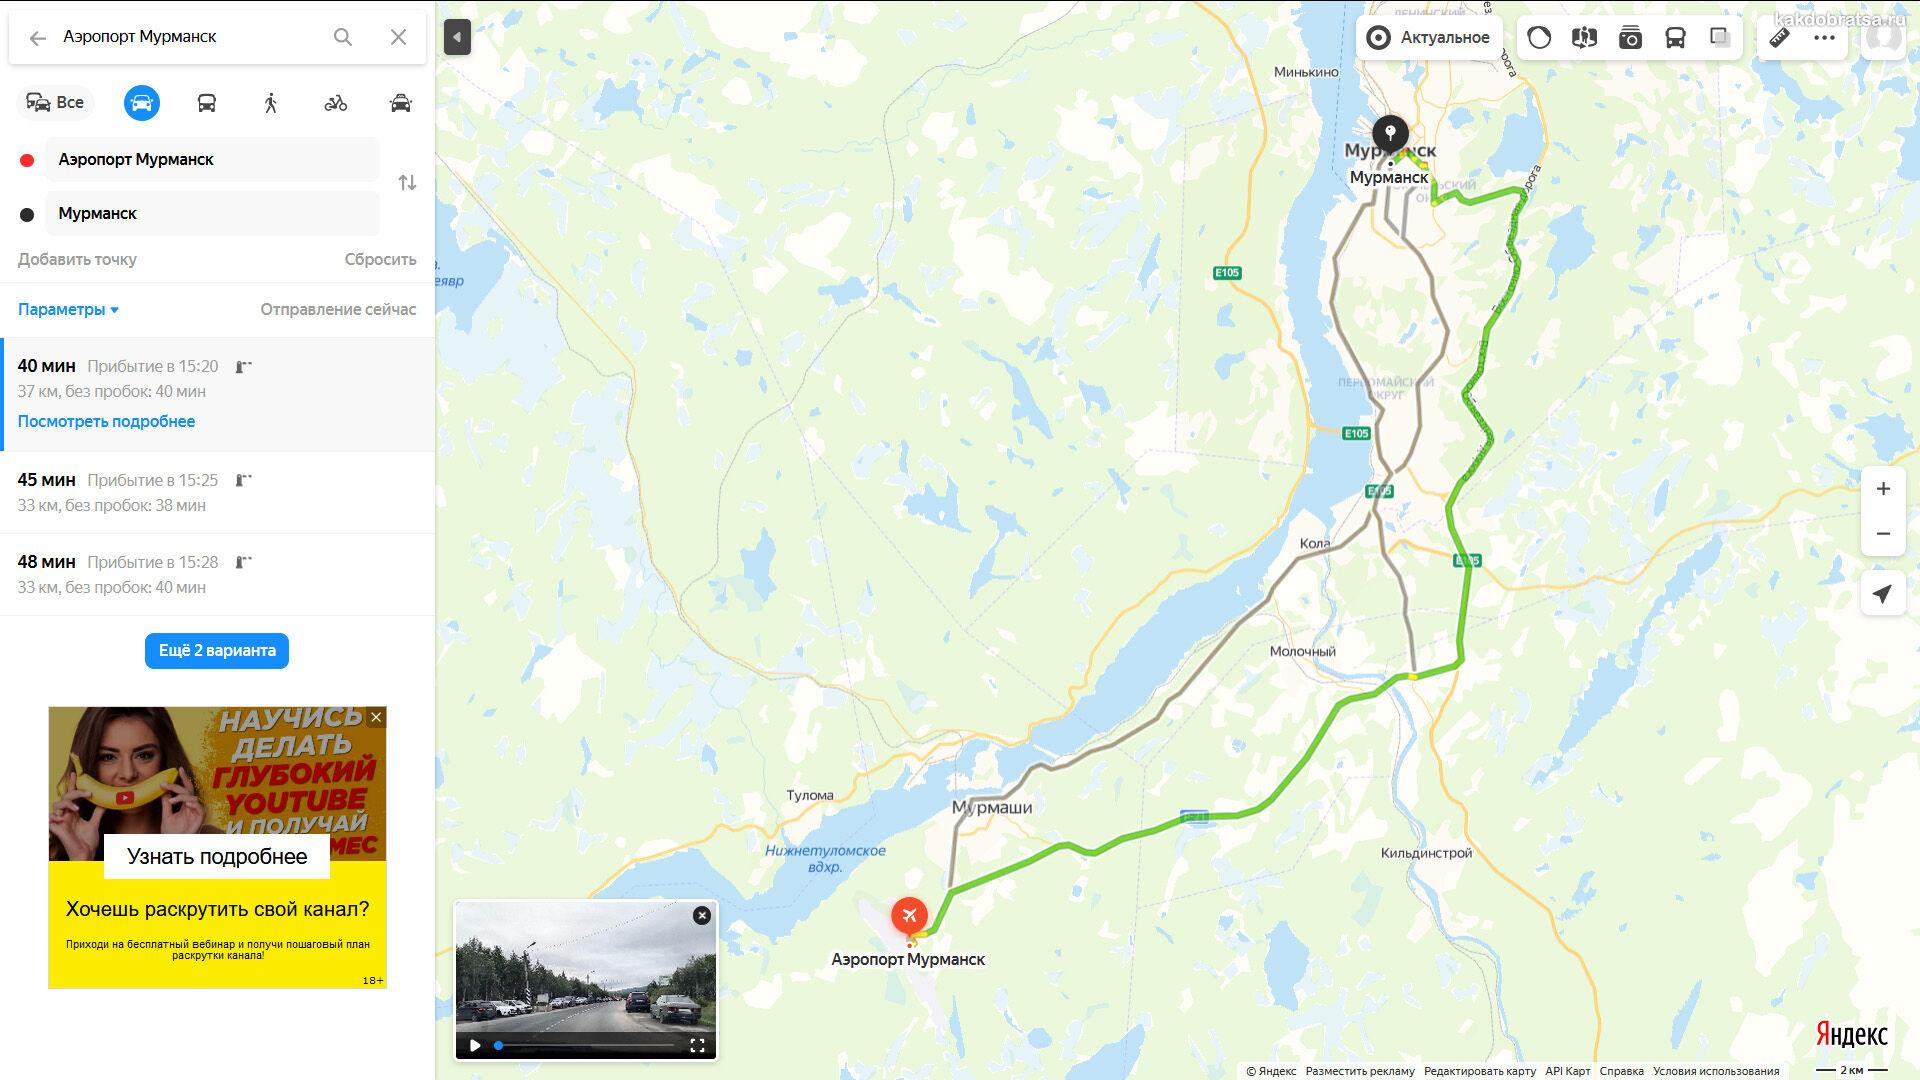 Аэропорт Мурманска на карте и адрес